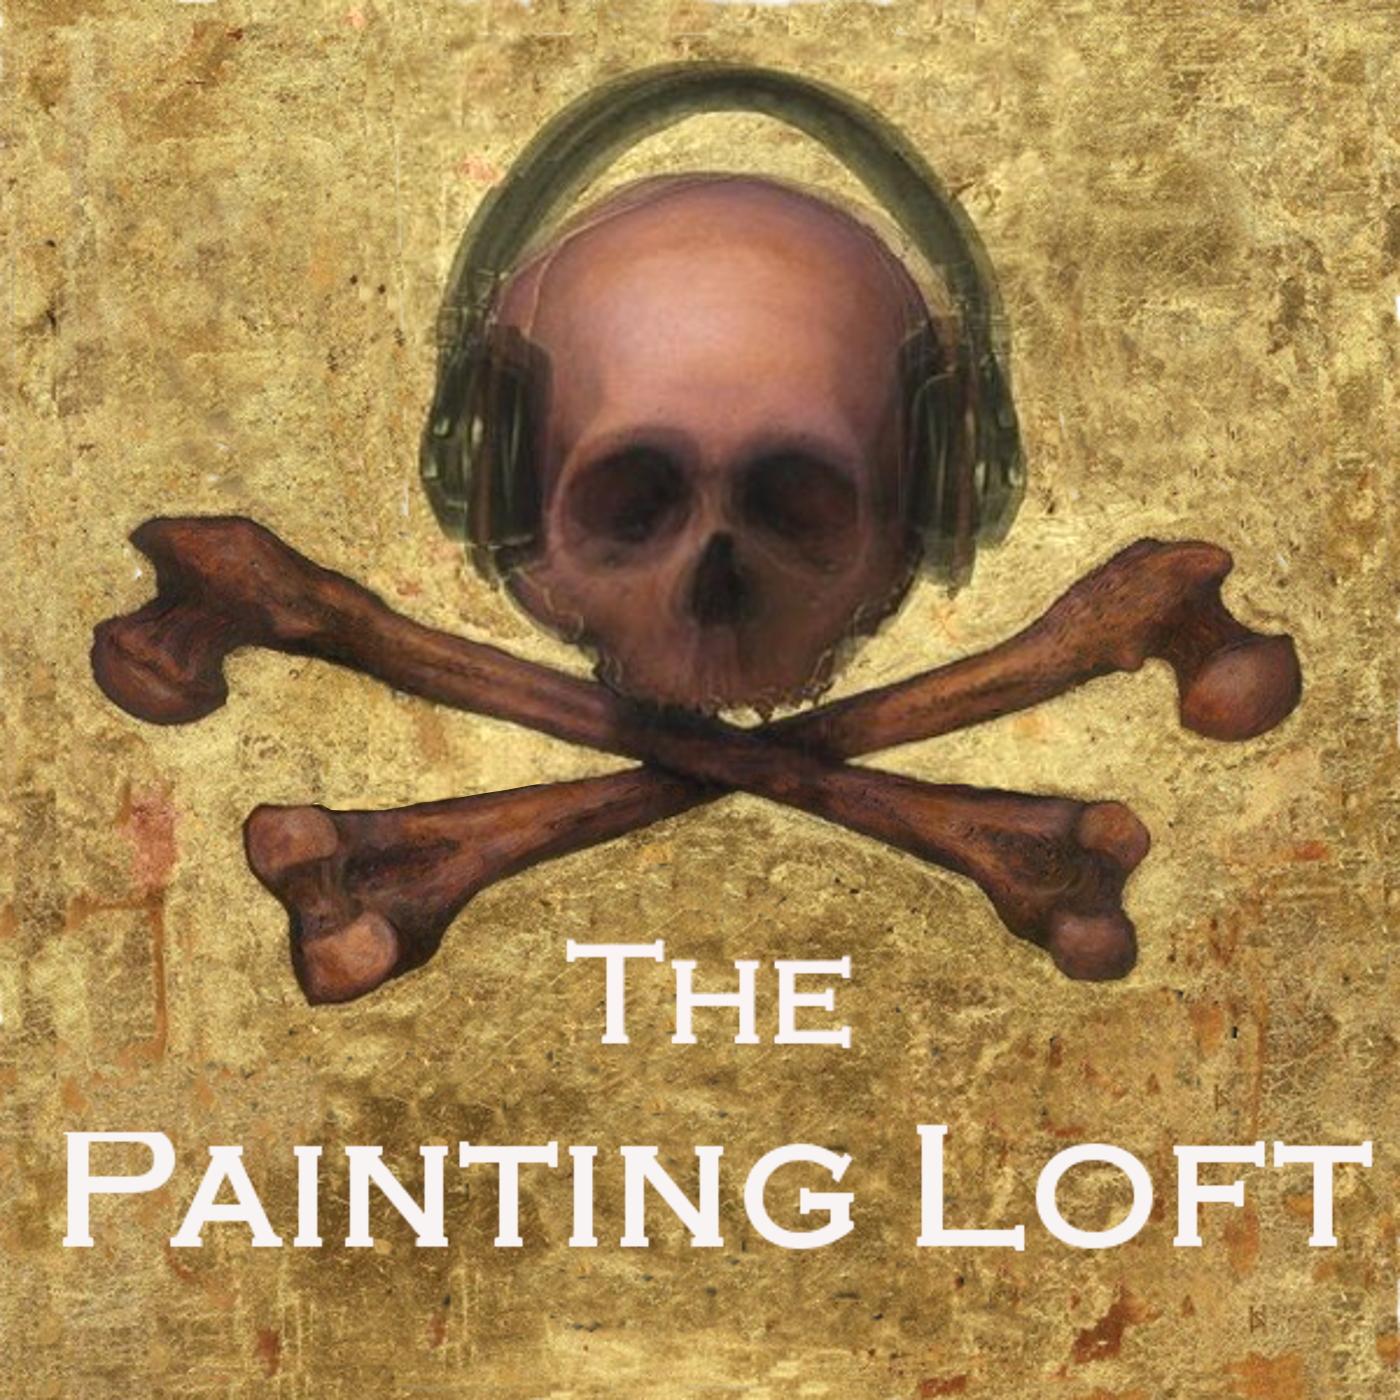 PaintingLoft Podcast show art